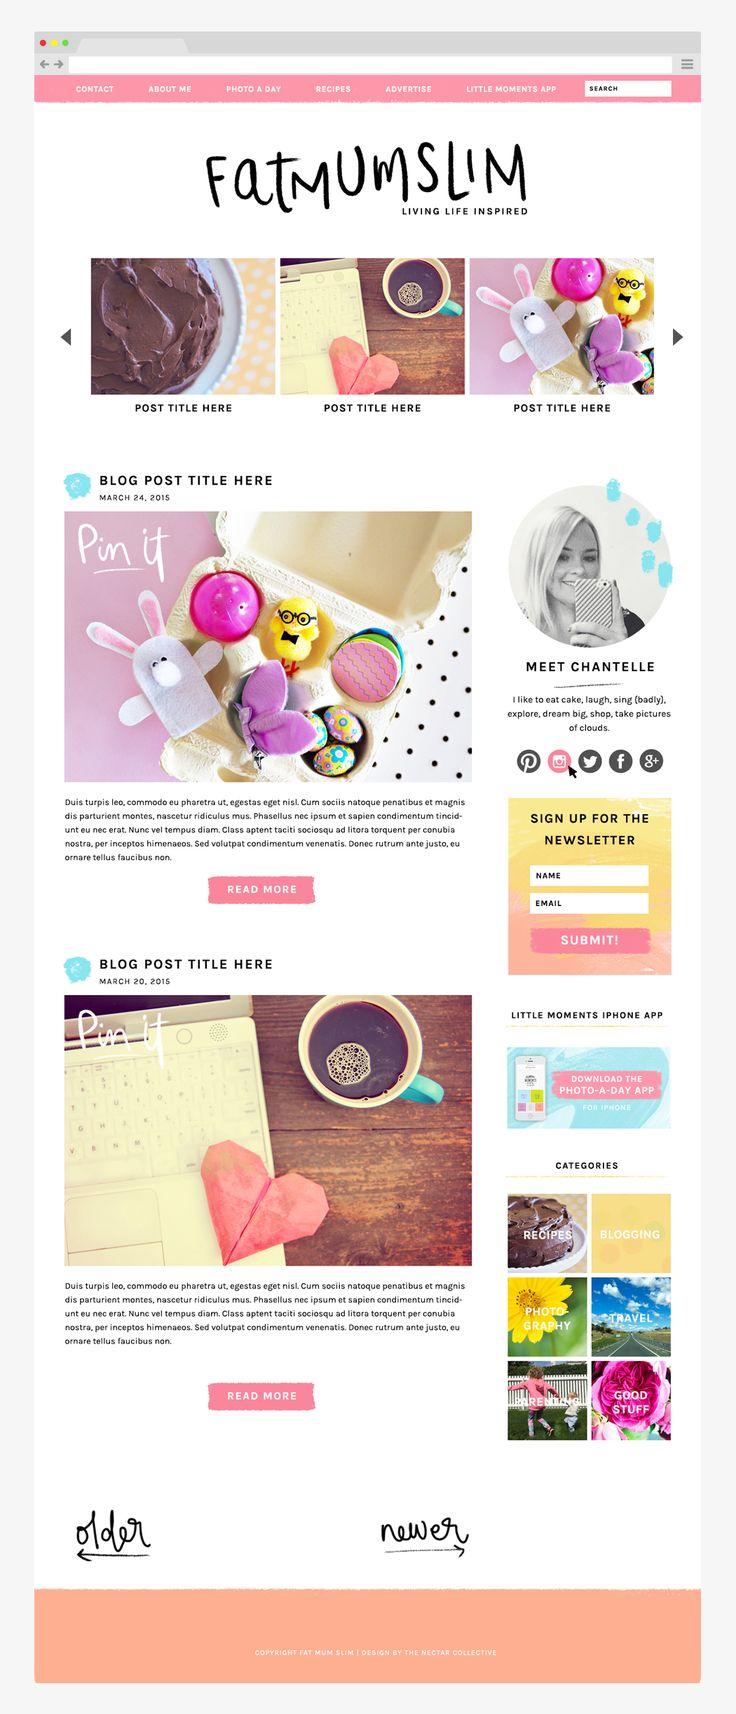 75 best Design || Web images on Pinterest | Page layout, Design web ...